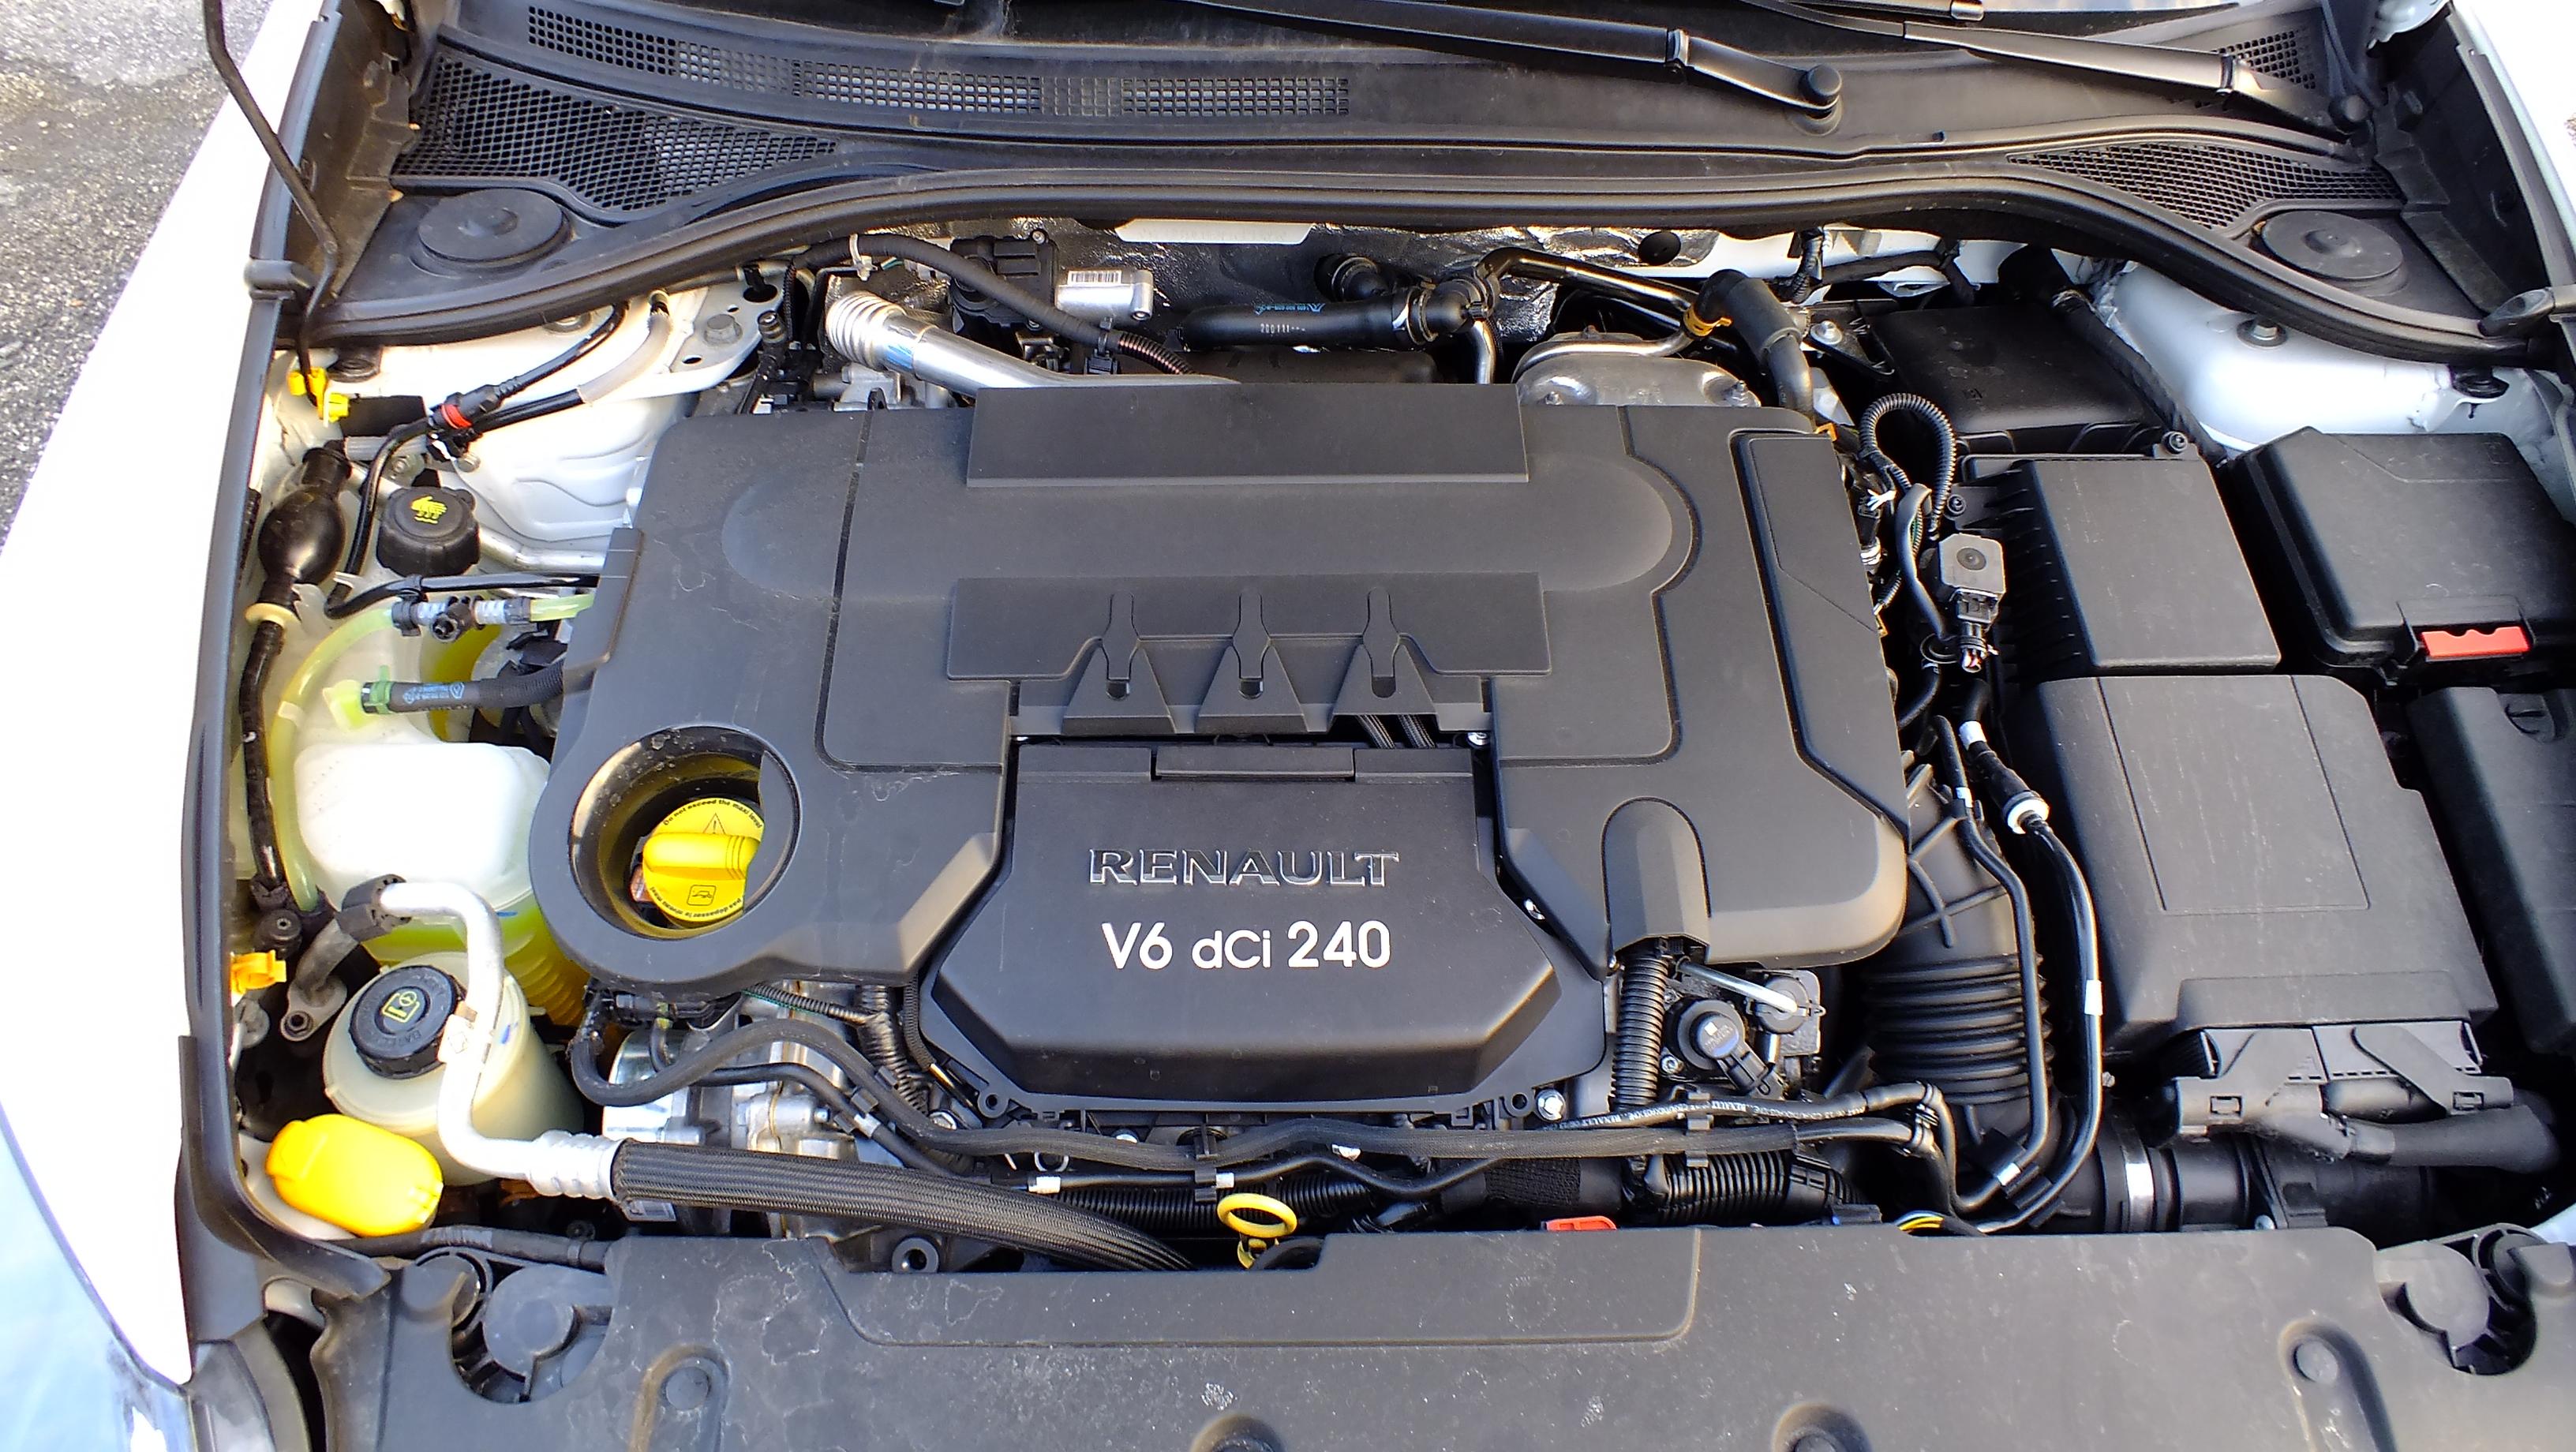 Renault Laguna Coupe 3.0 dCi V6